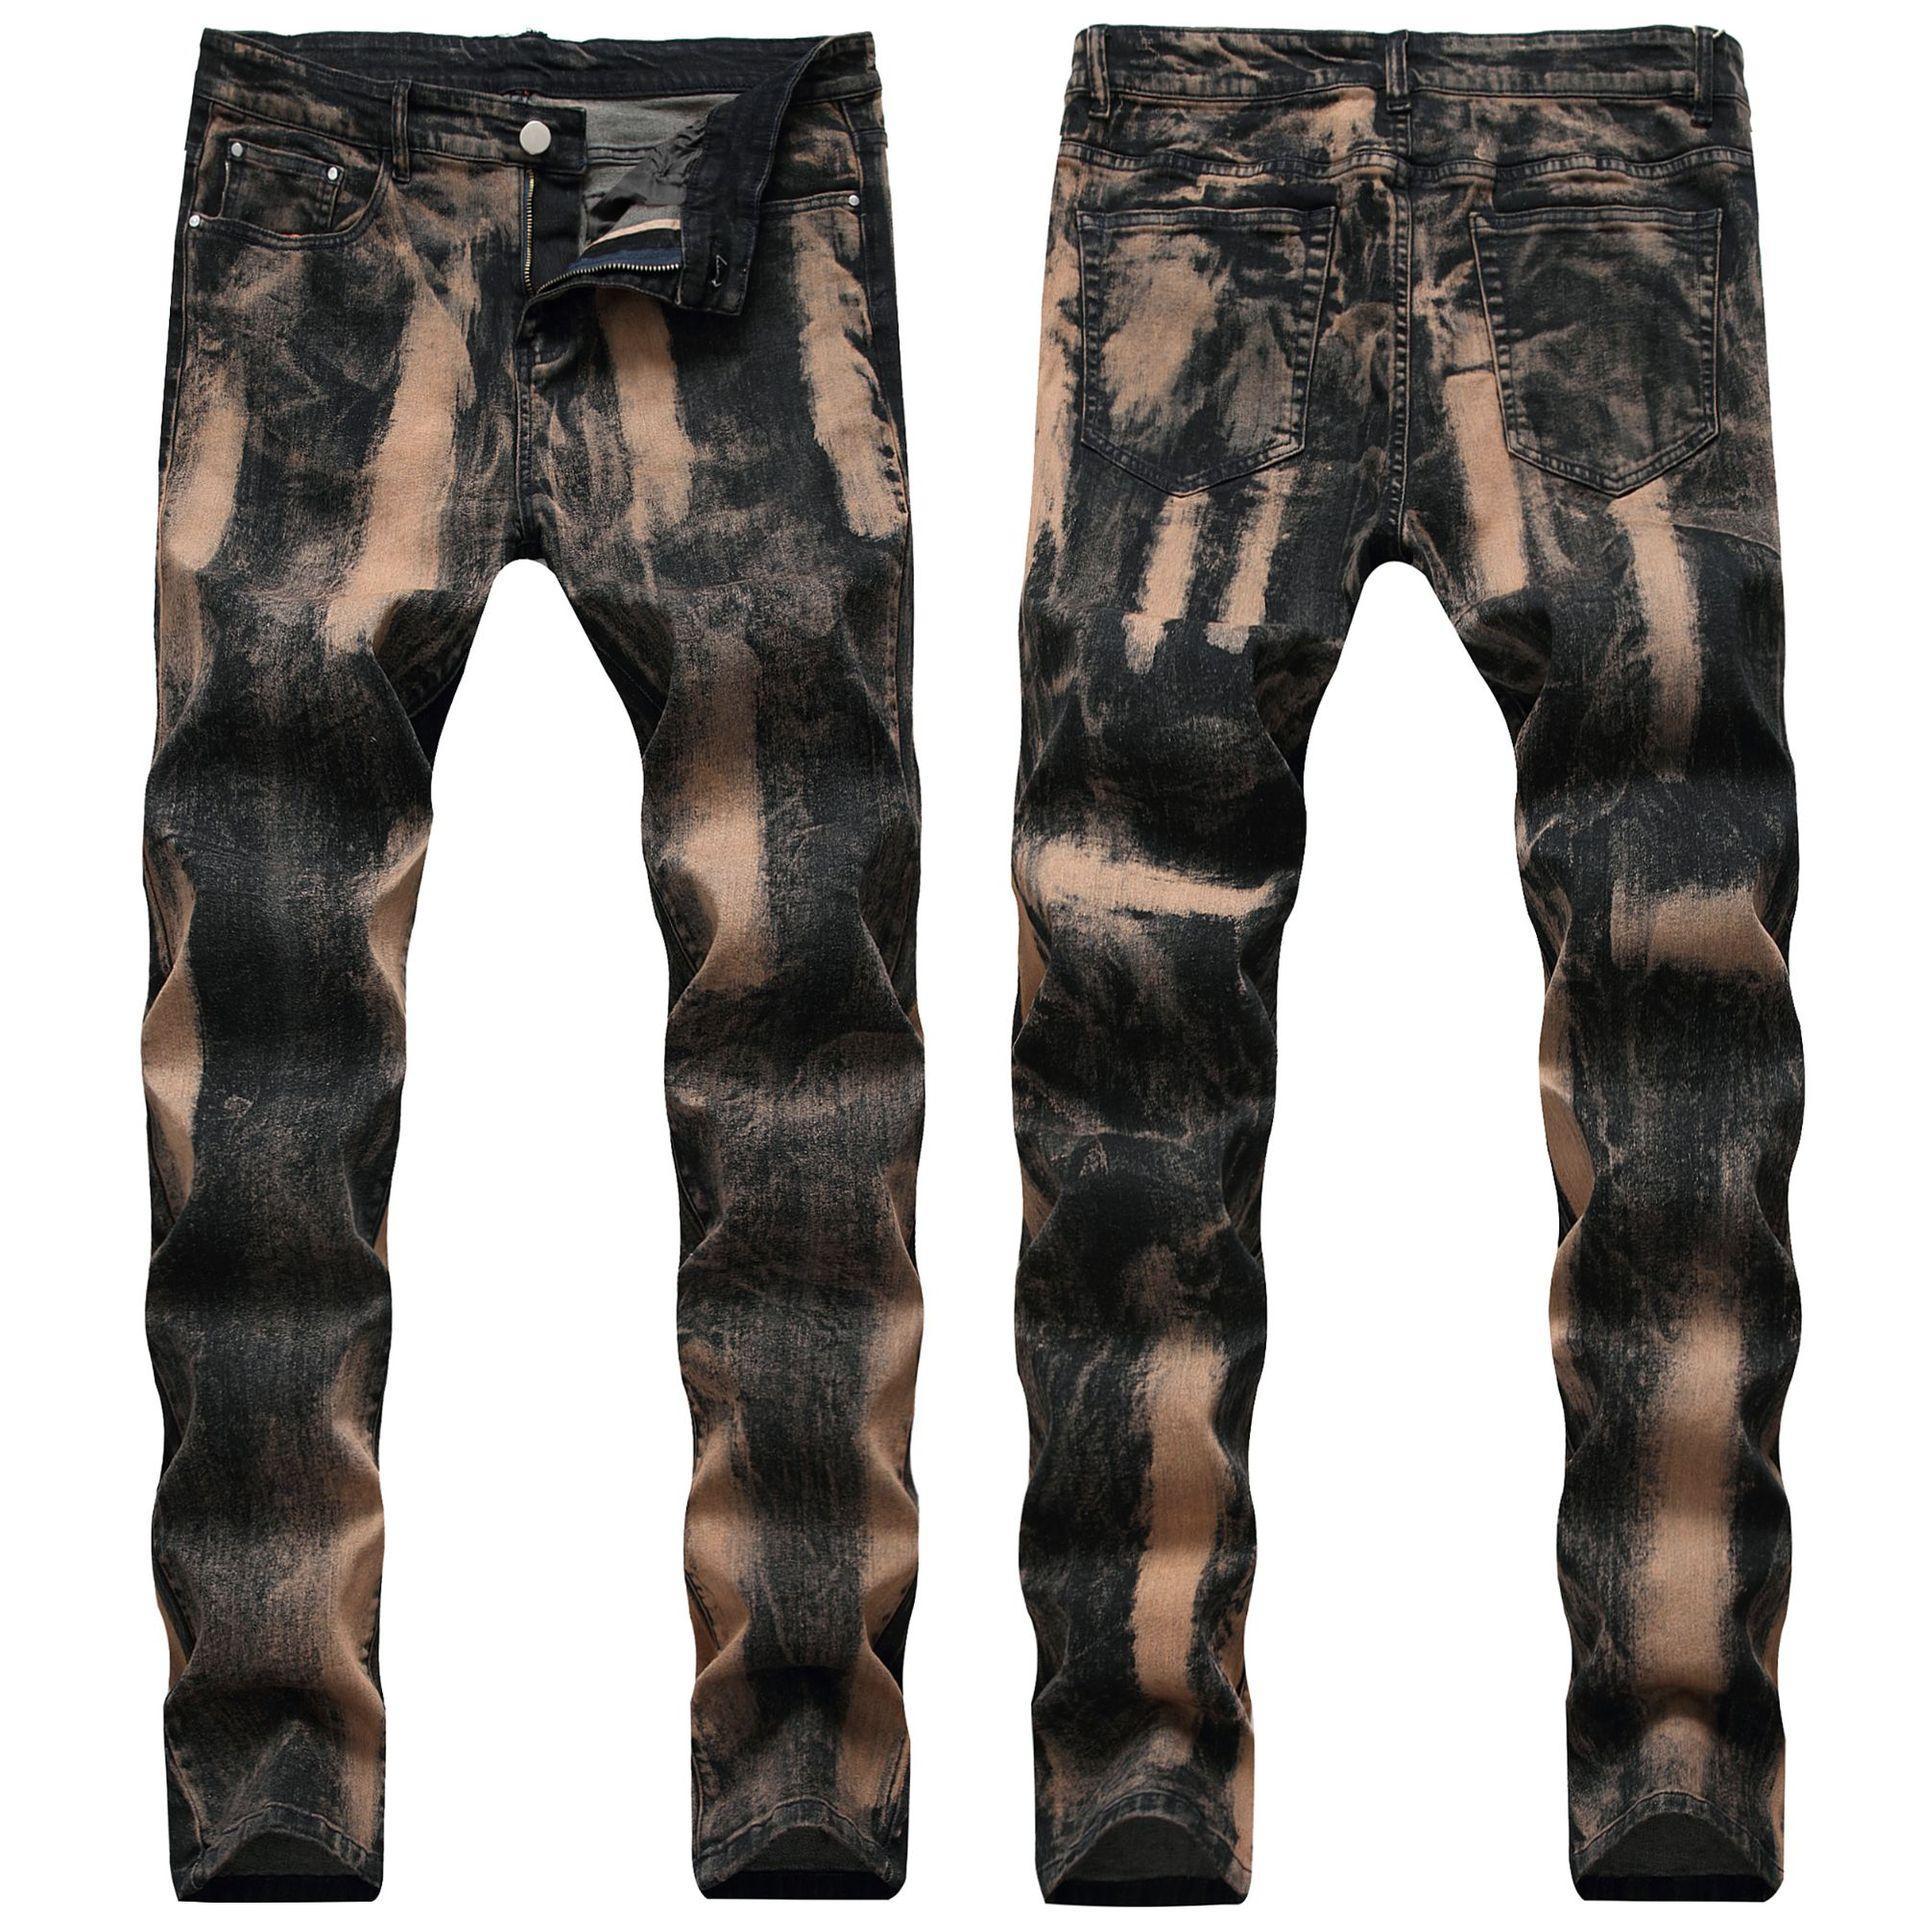 Skinny Mens Vintage Jeans Cool Uomo Distressed Stretch Jeans Slim fit Dritto Denim Biker Jeans Hip Hop Men Streetwear 0777 #